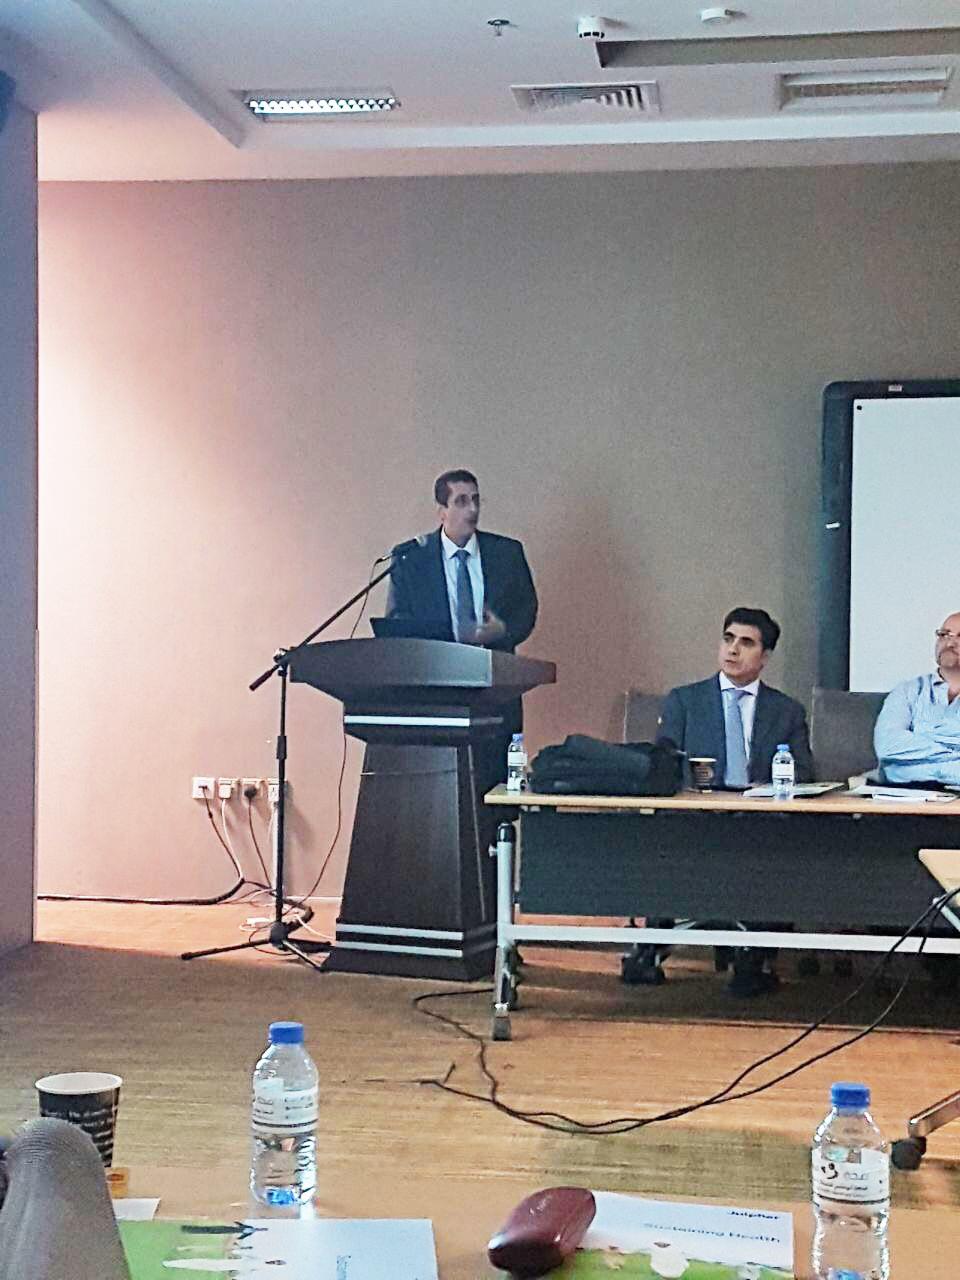 Julphar Participates in the Pediatric Surgery Association Annual Meeting